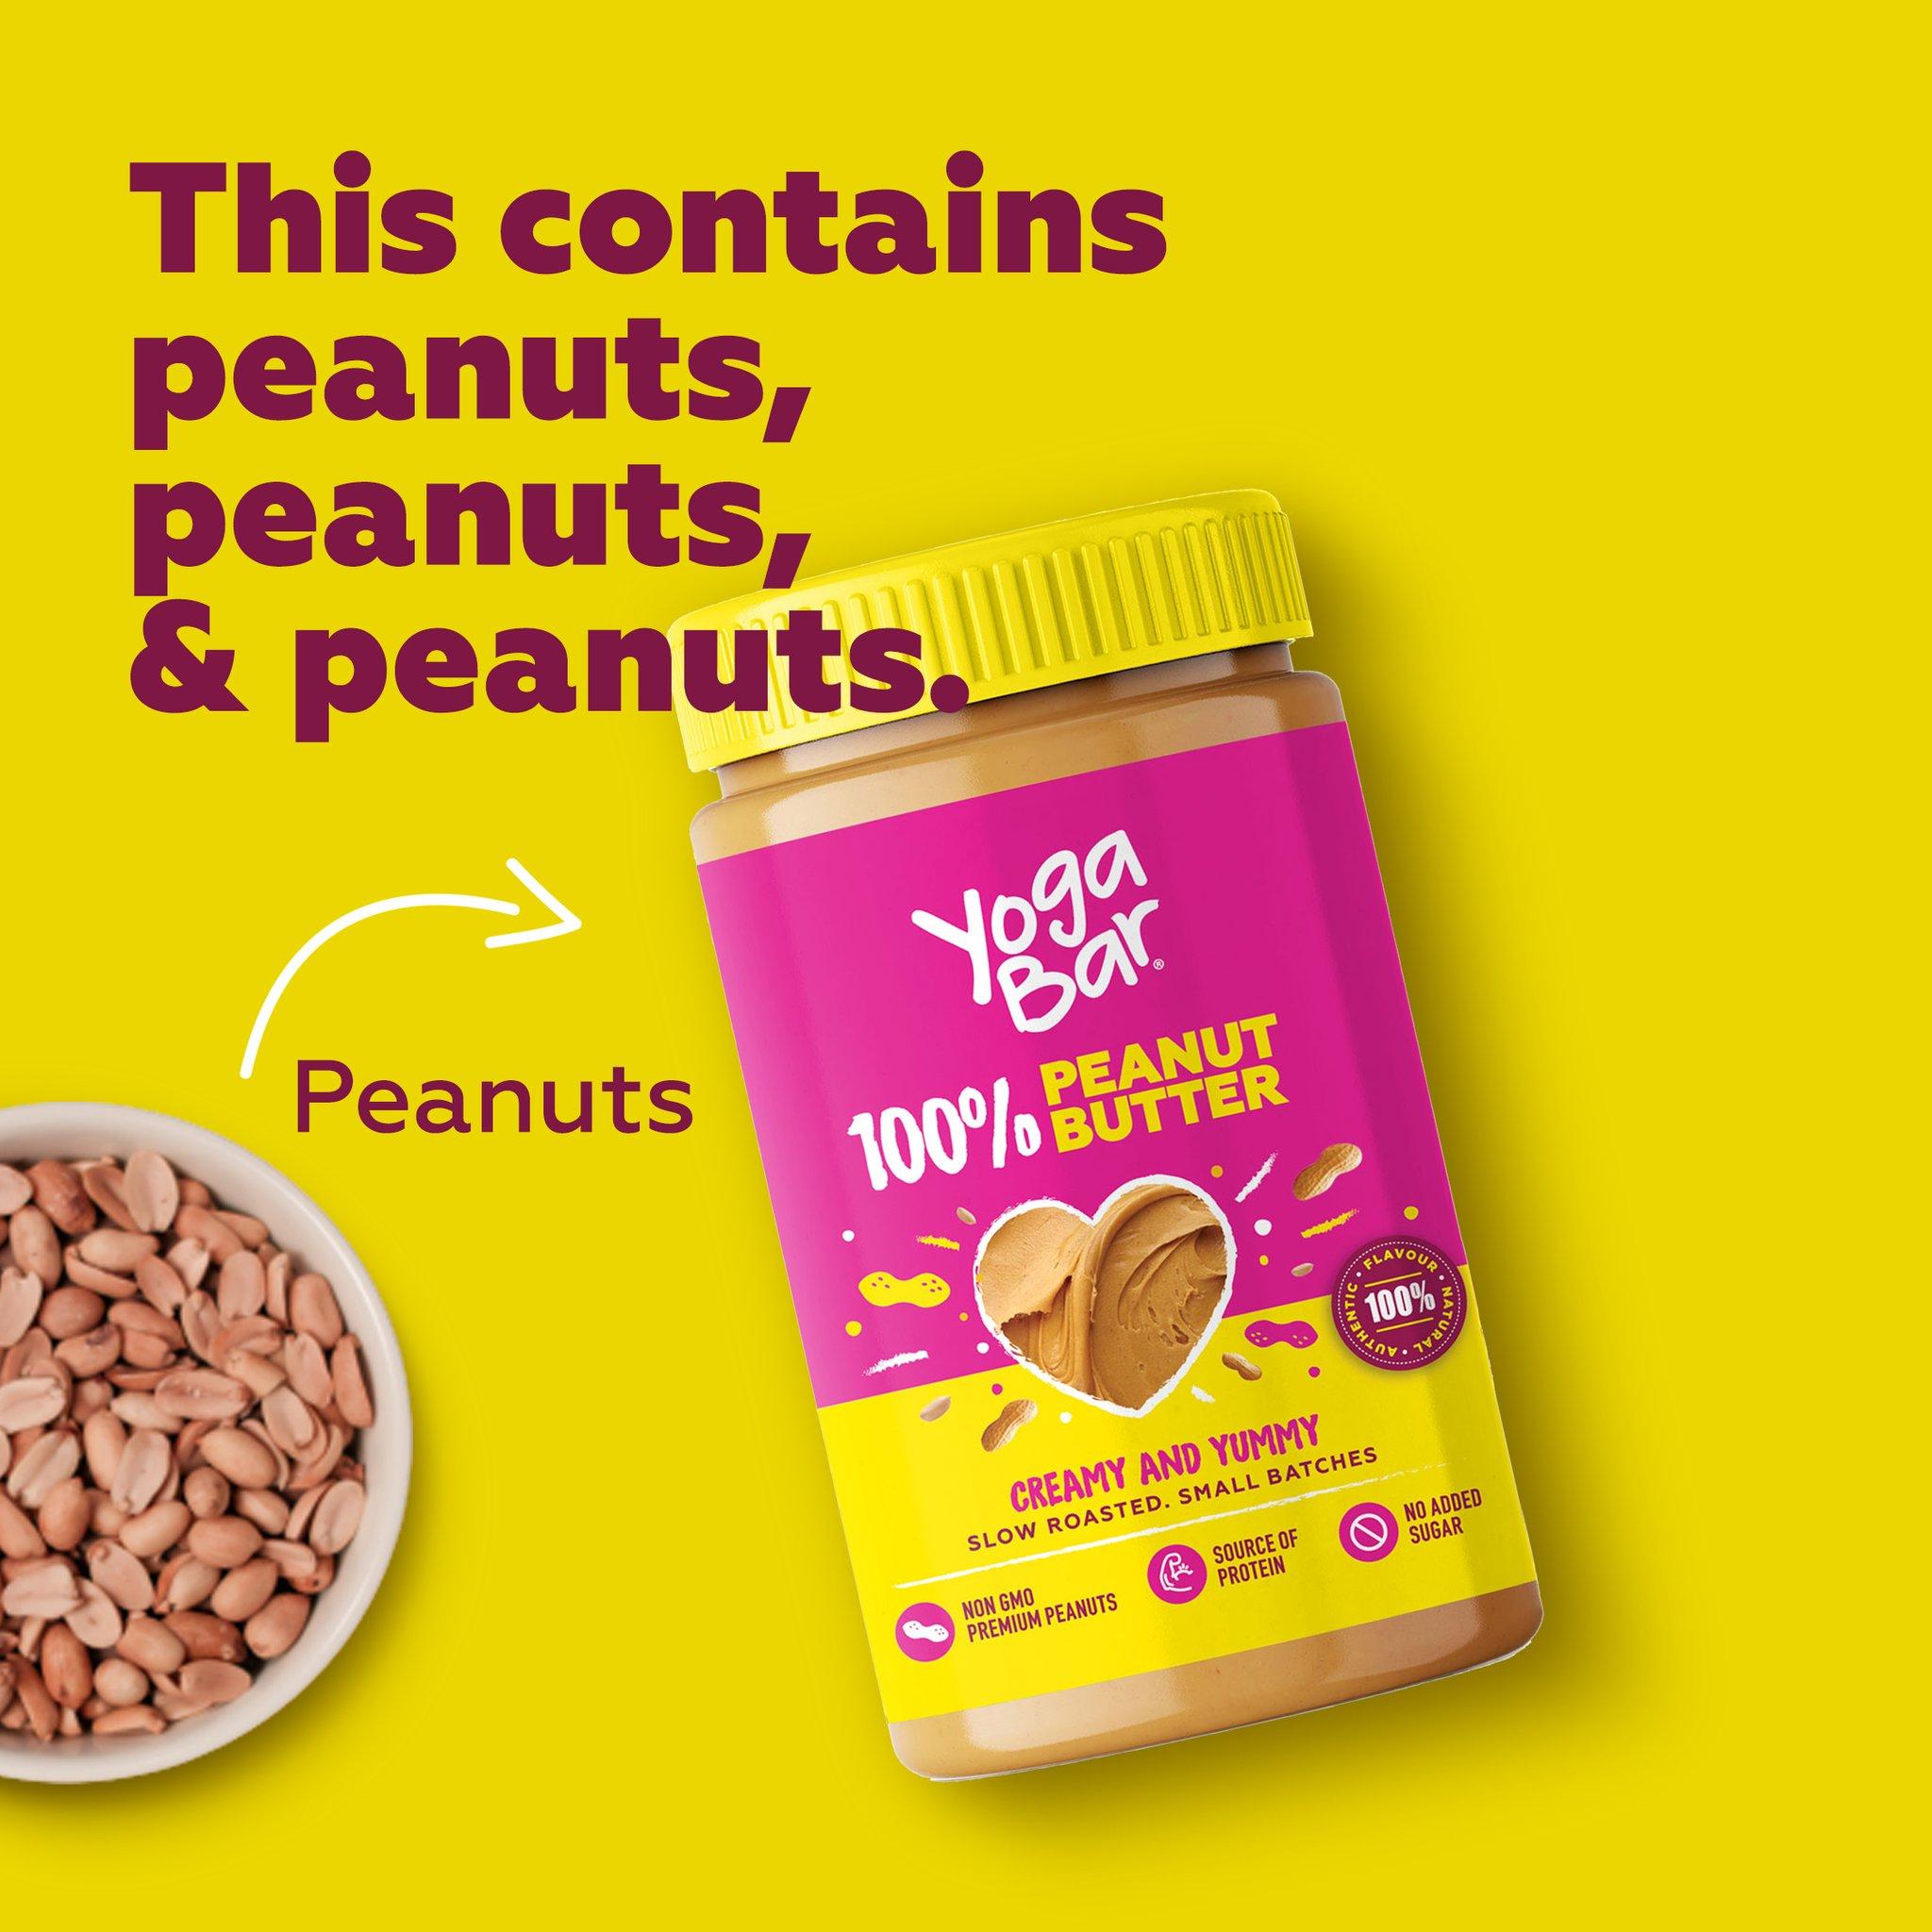 Yoga Bar 100% Pure Peanut Butter